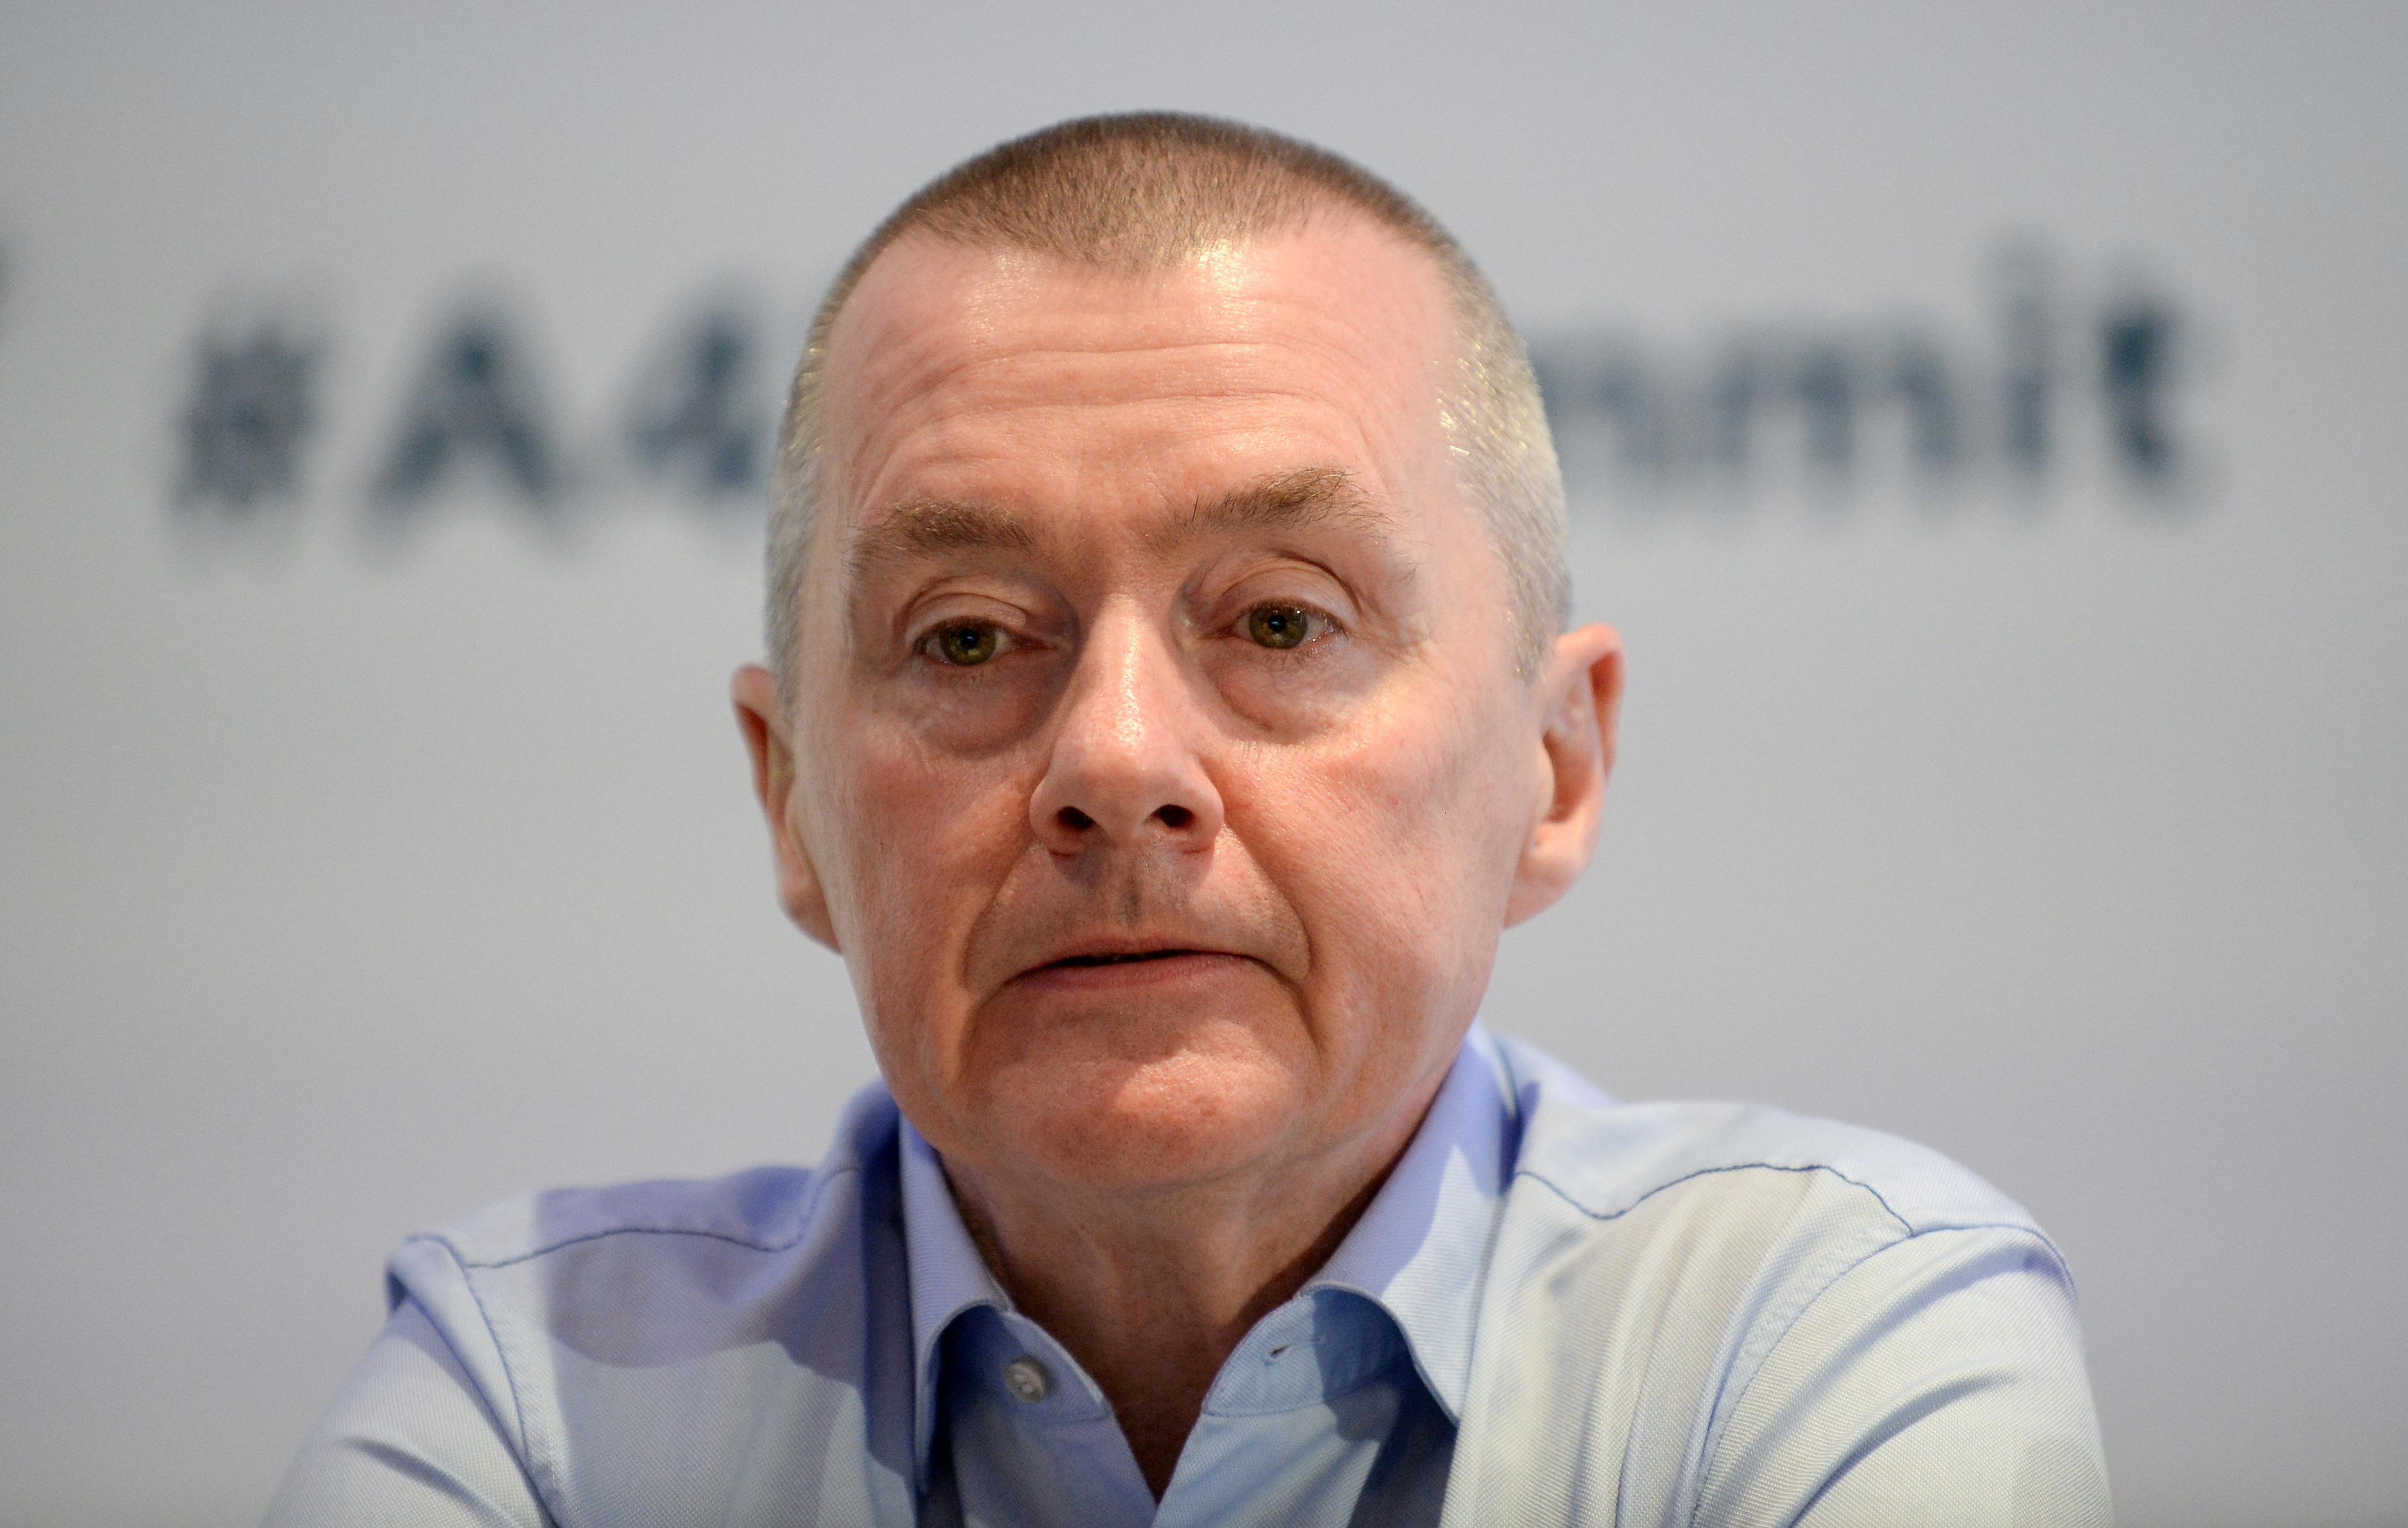 Willie Walsh, head of the International Air Transport Association (IATA), attends a meeting in Brussels, Belgium, March 3, 2020. REUTERS/Johanna Geron